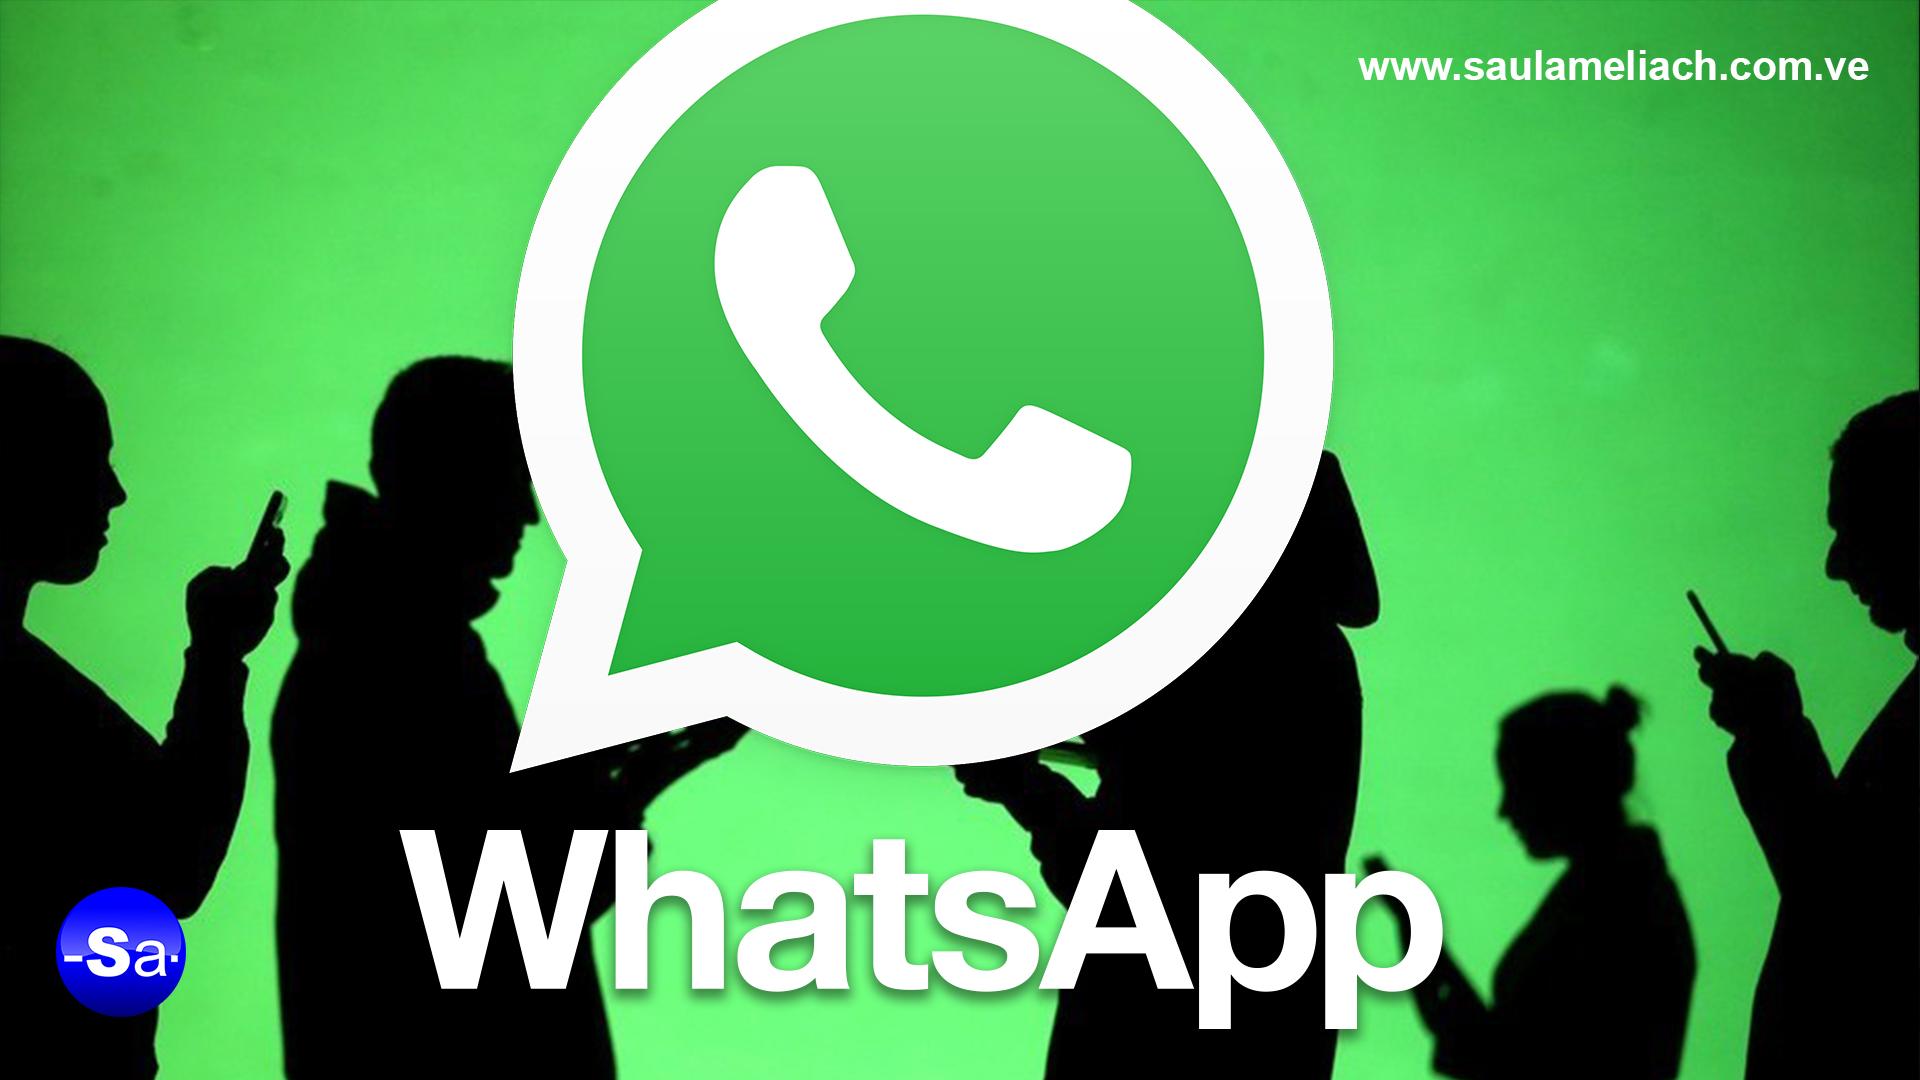 Saul Ameliach manual de etiquetas para WhatsApp